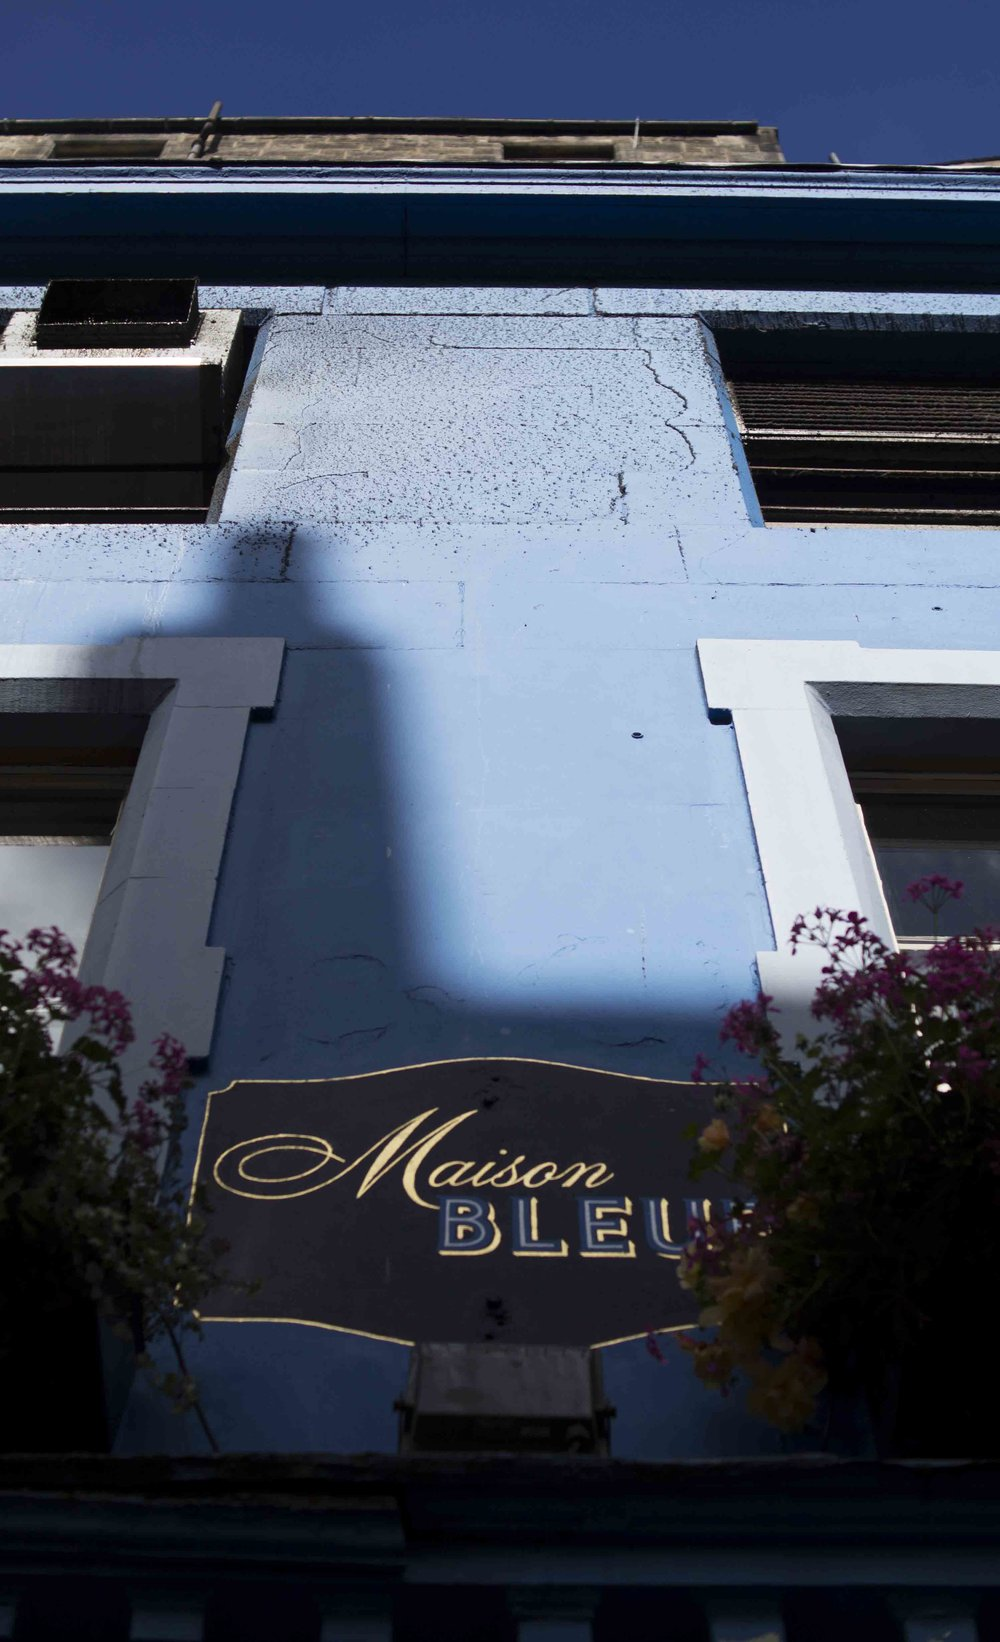 Maison Bleue In Sunshine and Shadows, Edinburgh